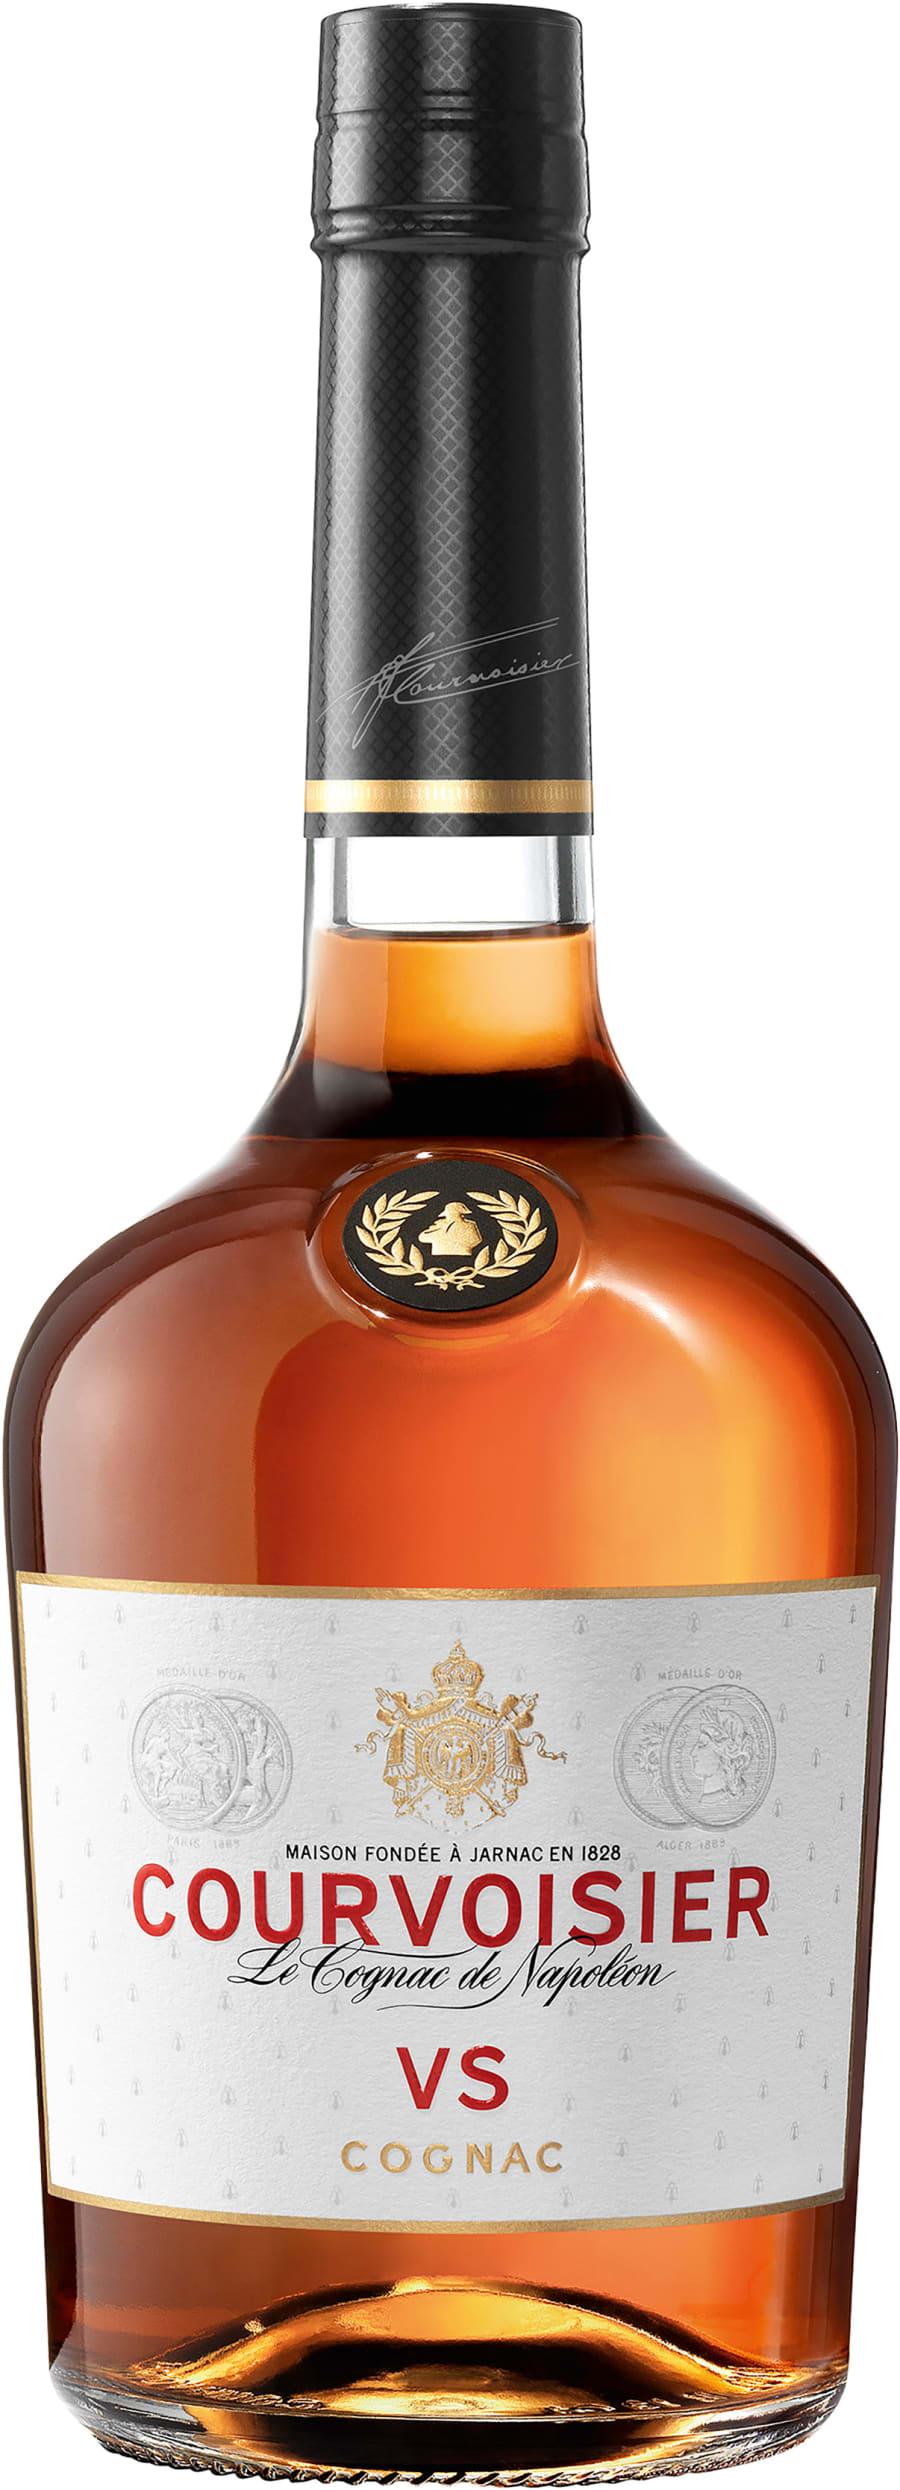 Courvoisier vs cognacs alko zoom icon courvoisier altavistaventures Gallery